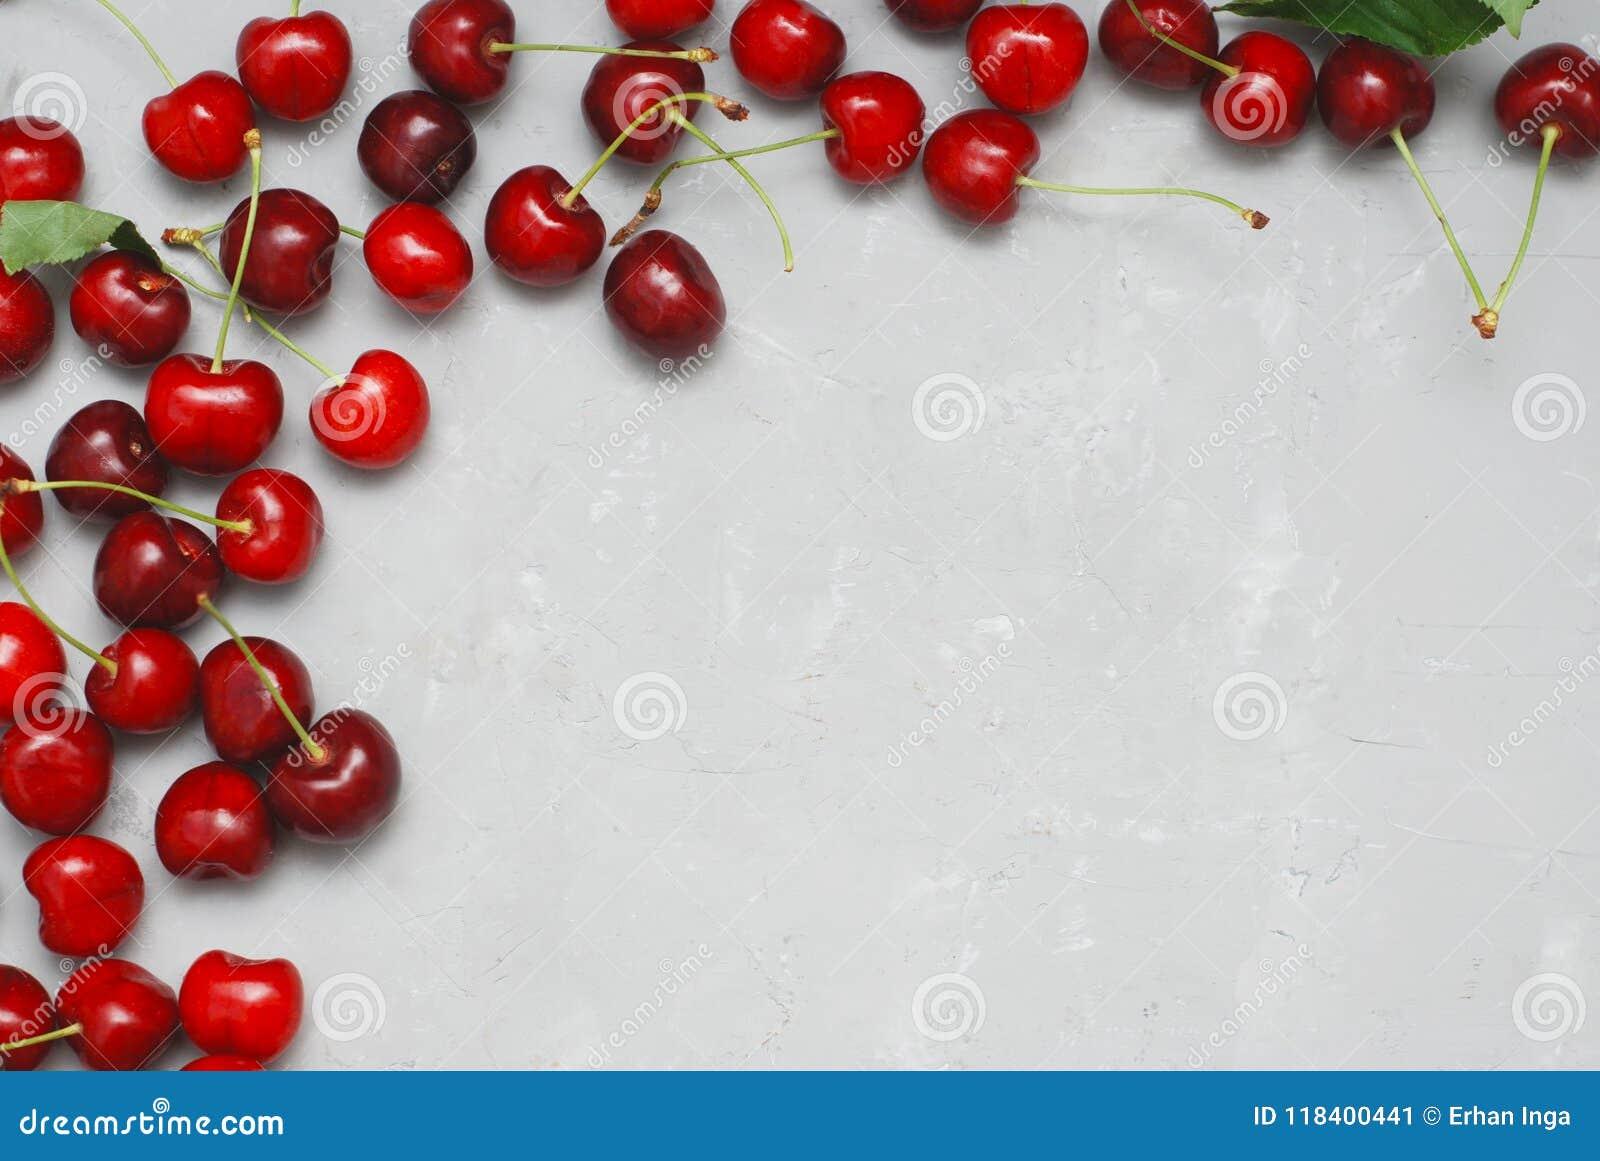 Nya Cherry Fruit Health Vitamine Frame texturerade Gray Cement Background med kopieringsutrymme Top beskådar